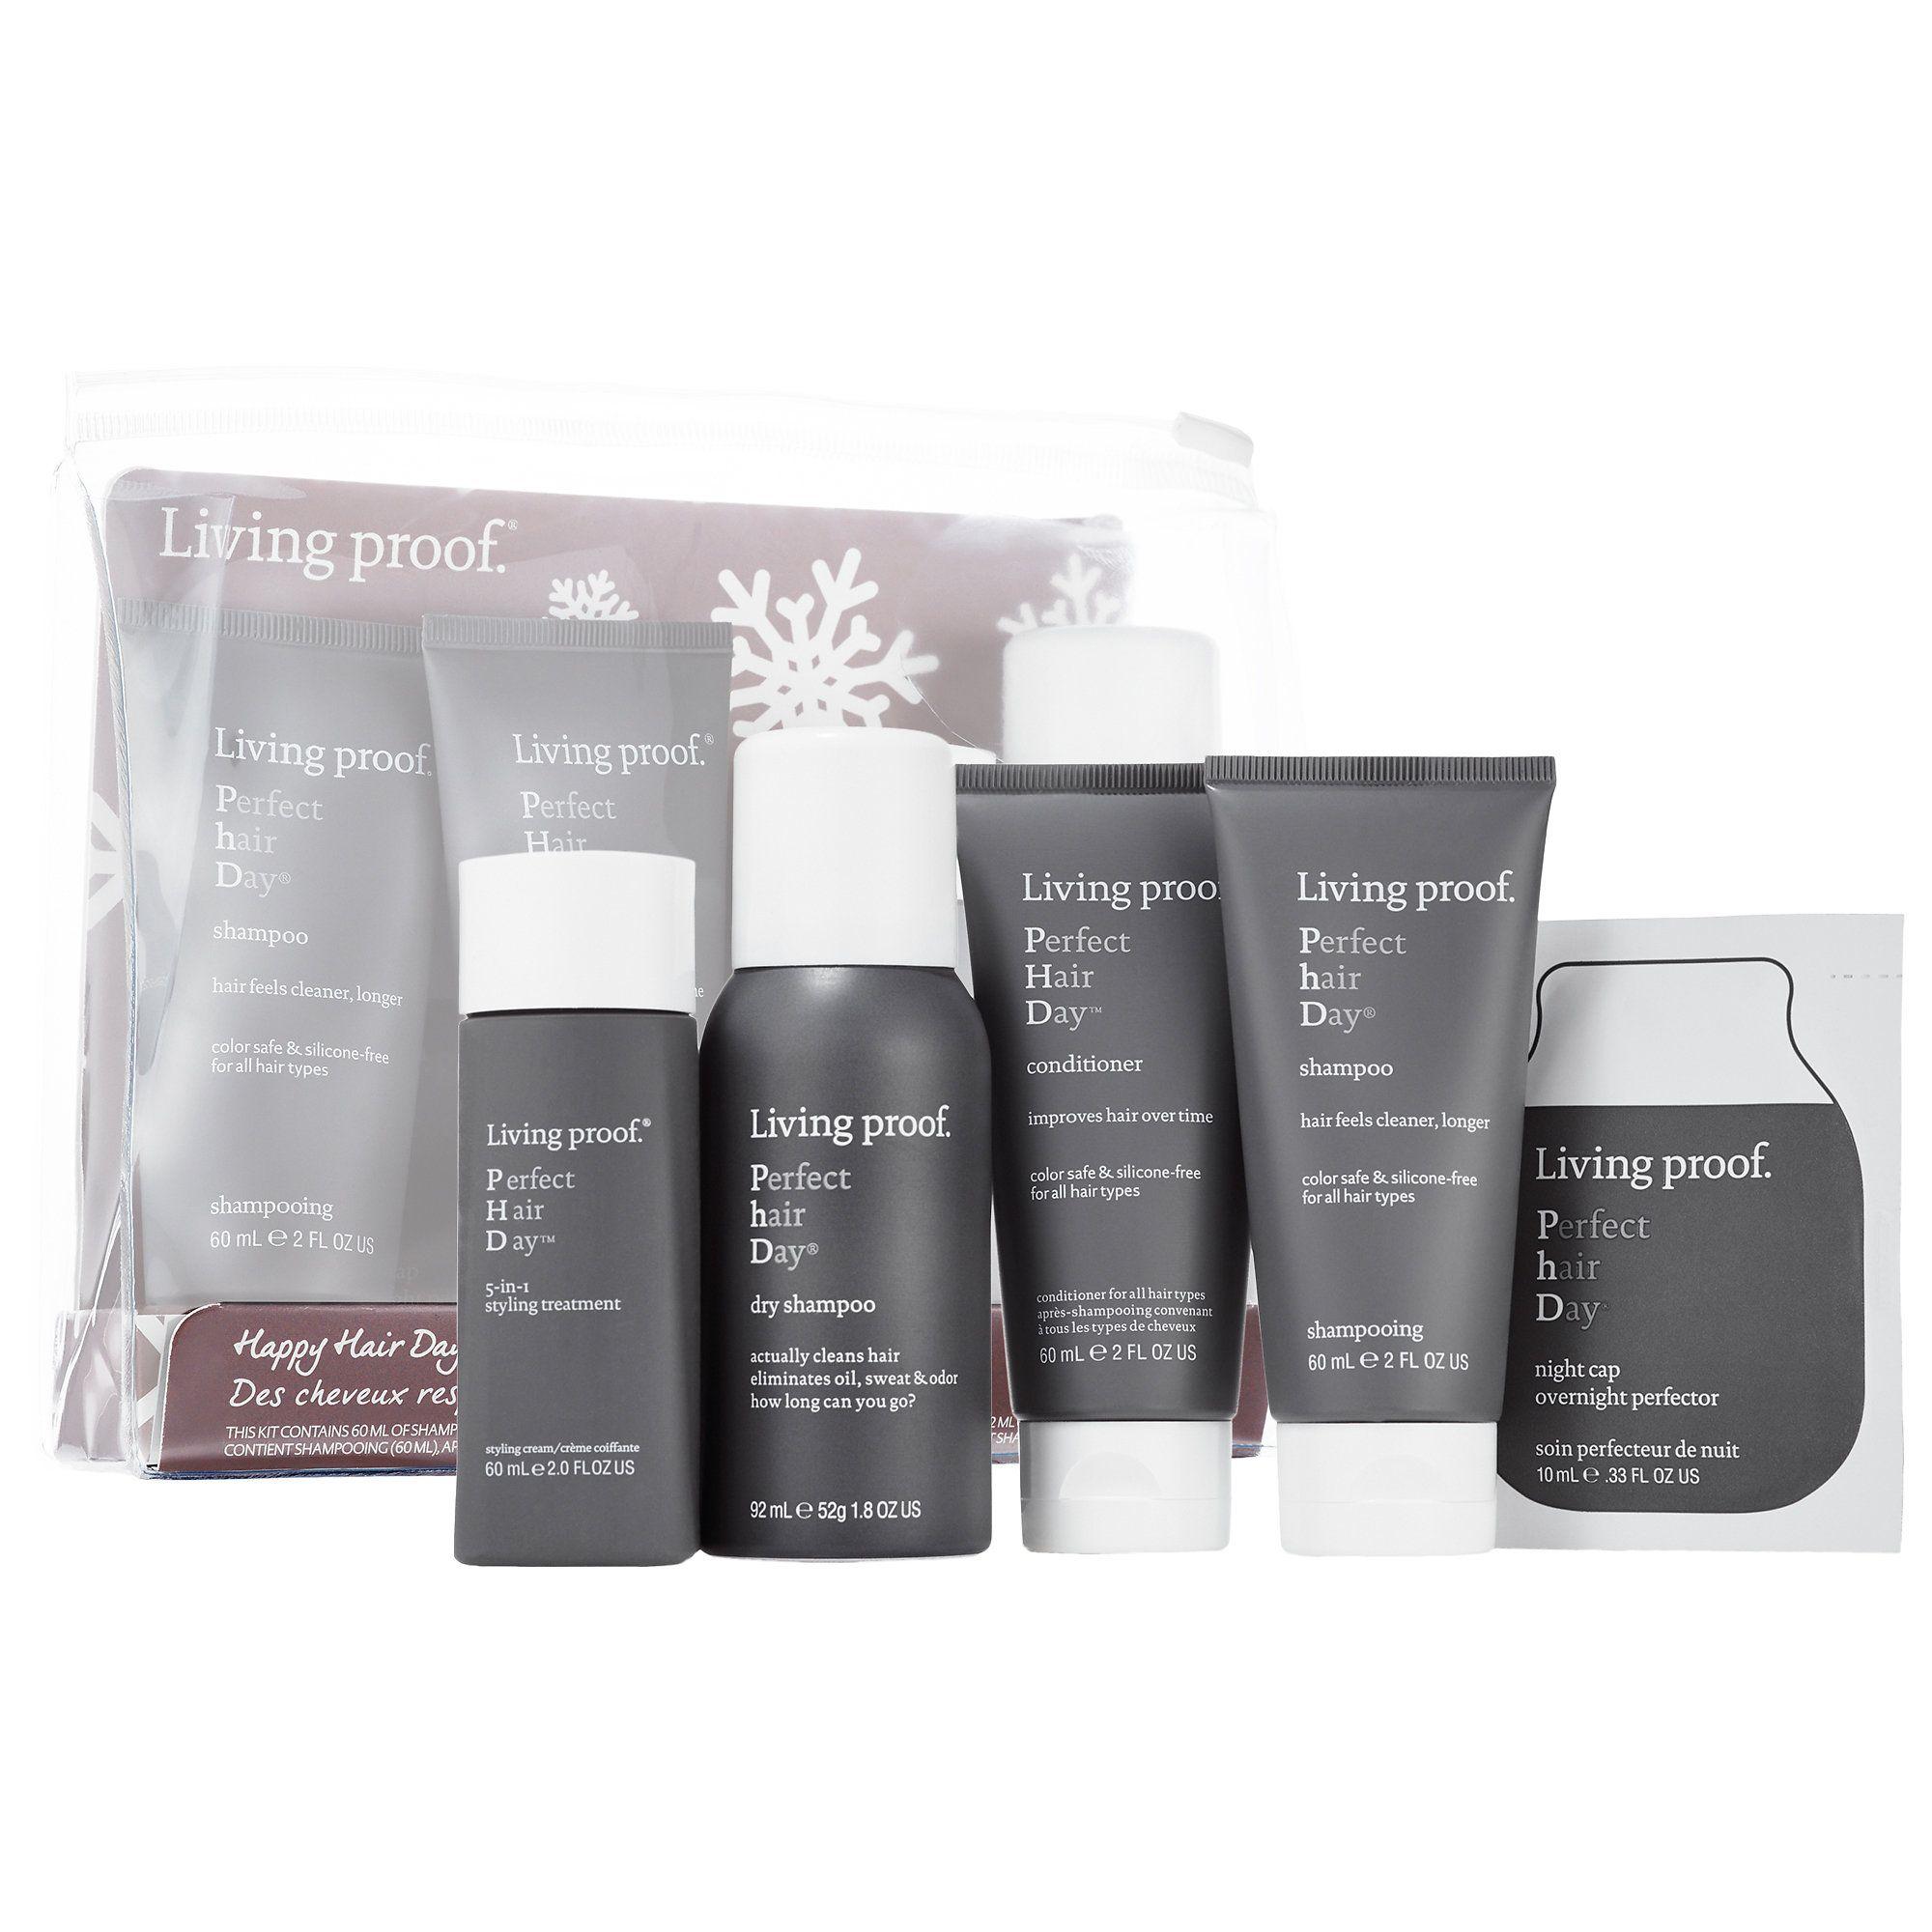 Sephora Living Proof Happy Hair Days Kit haircare